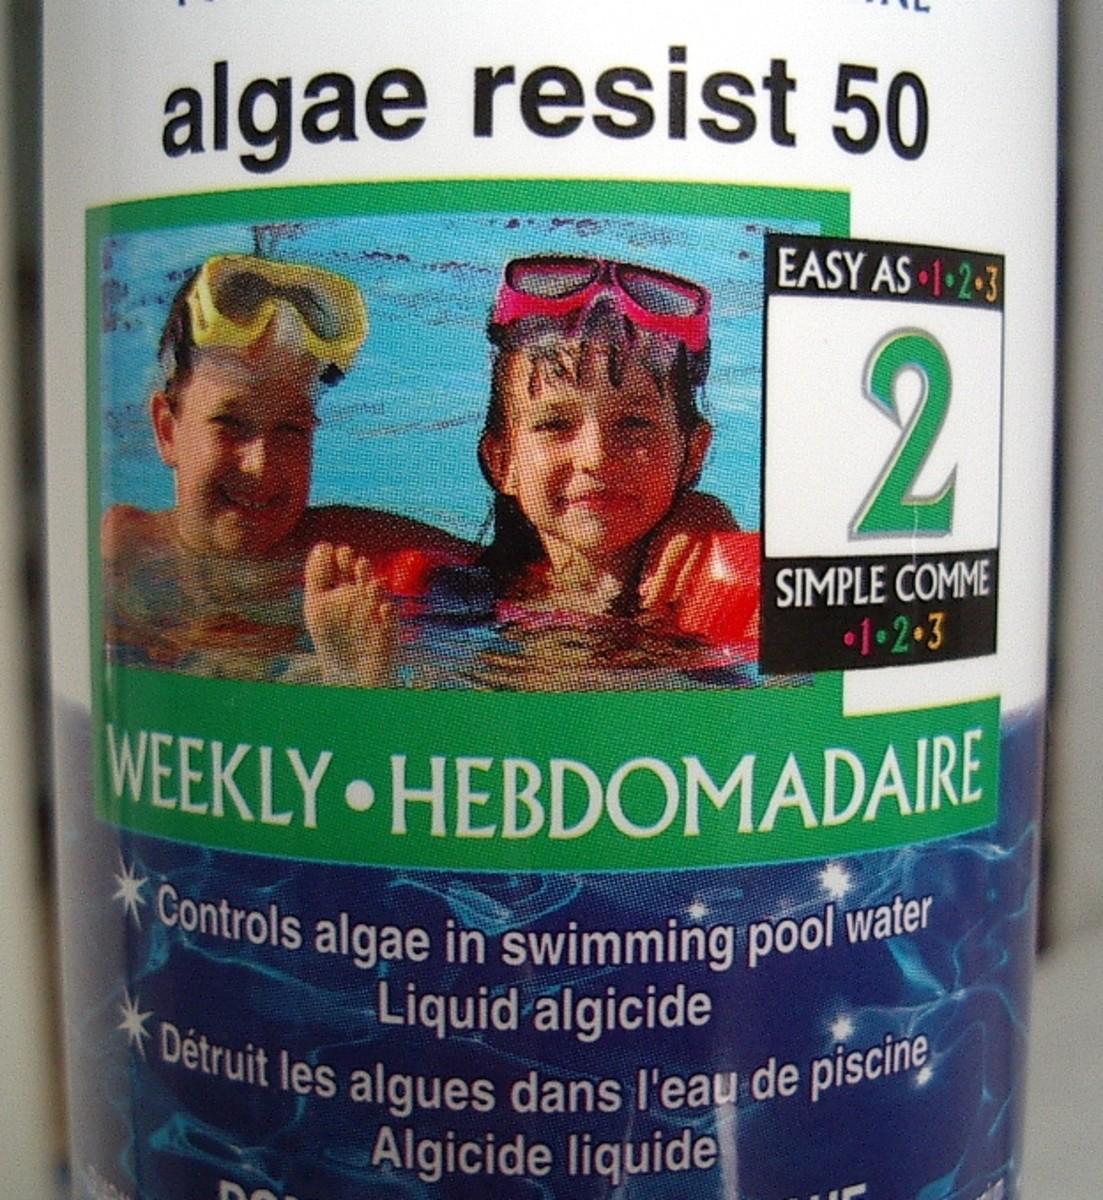 Use the algae resist if necessary